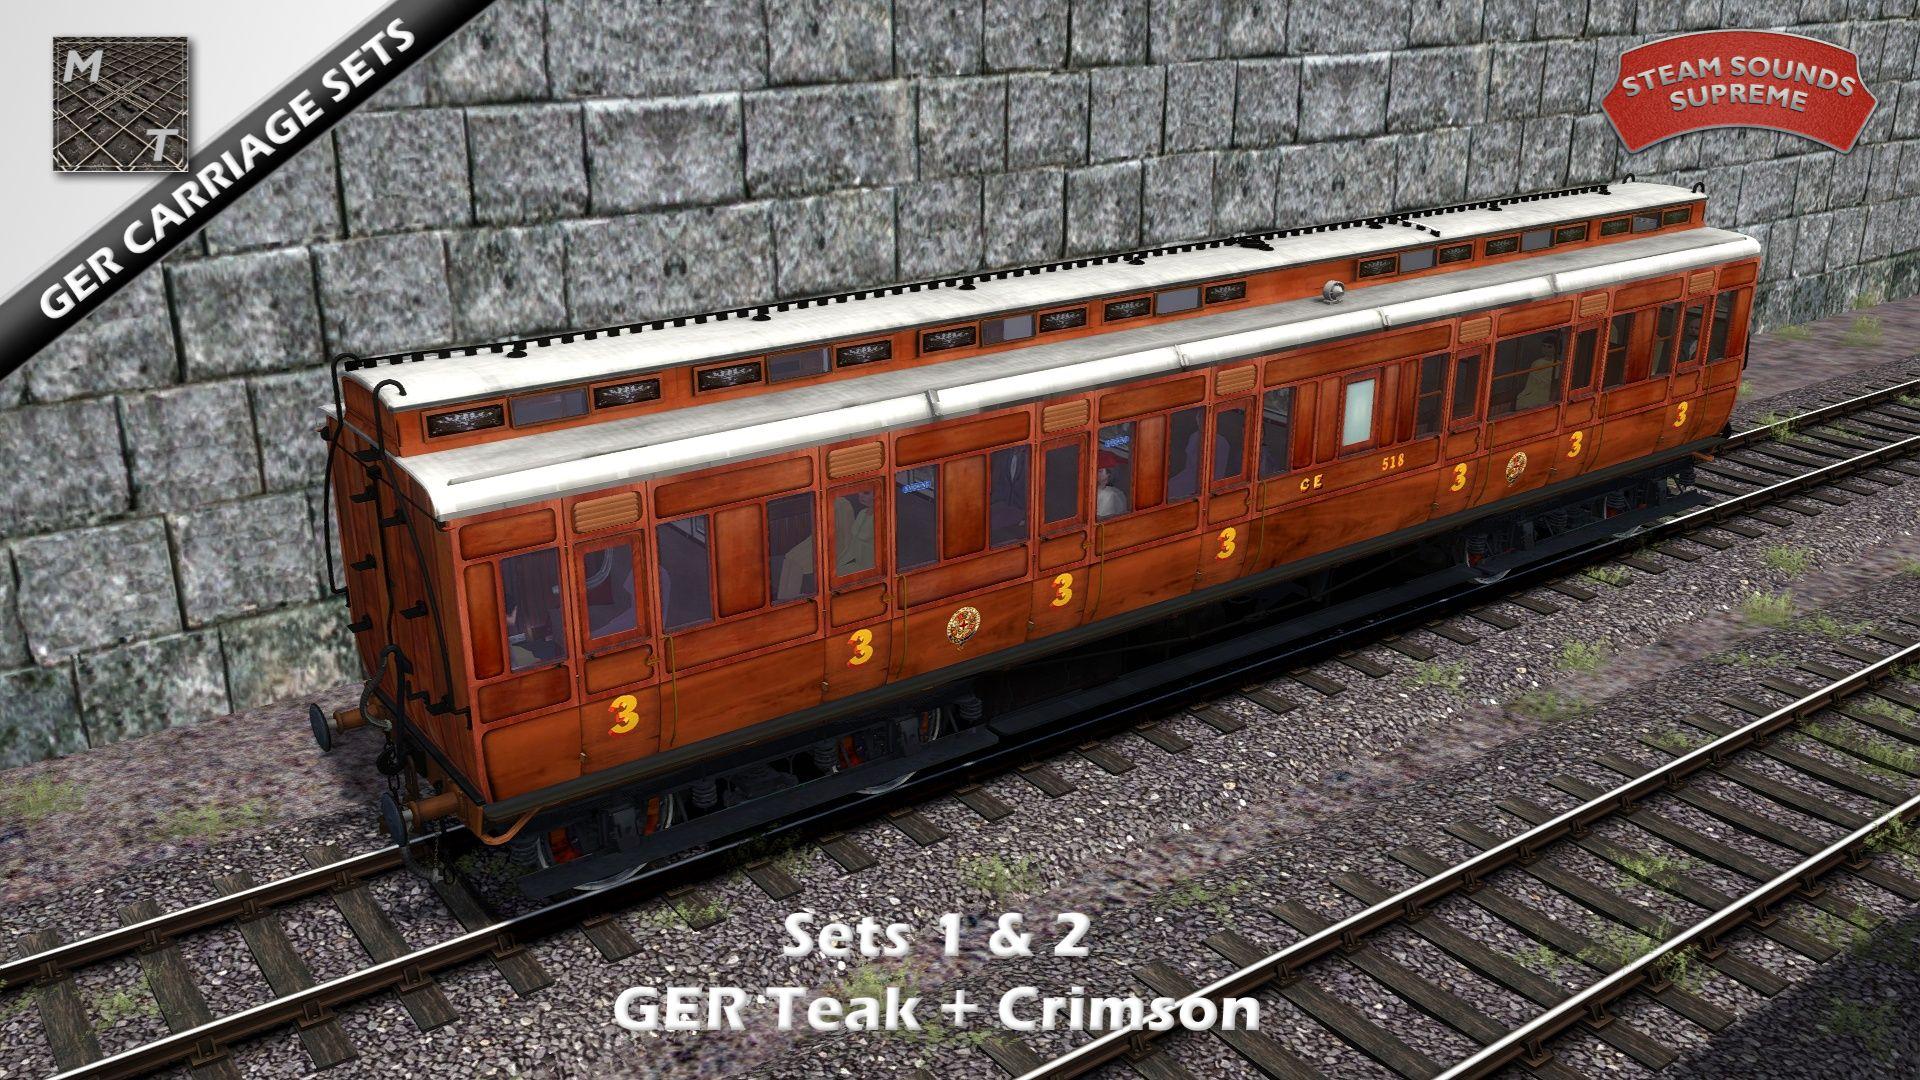 GERCorrSet1-2_11.jpg